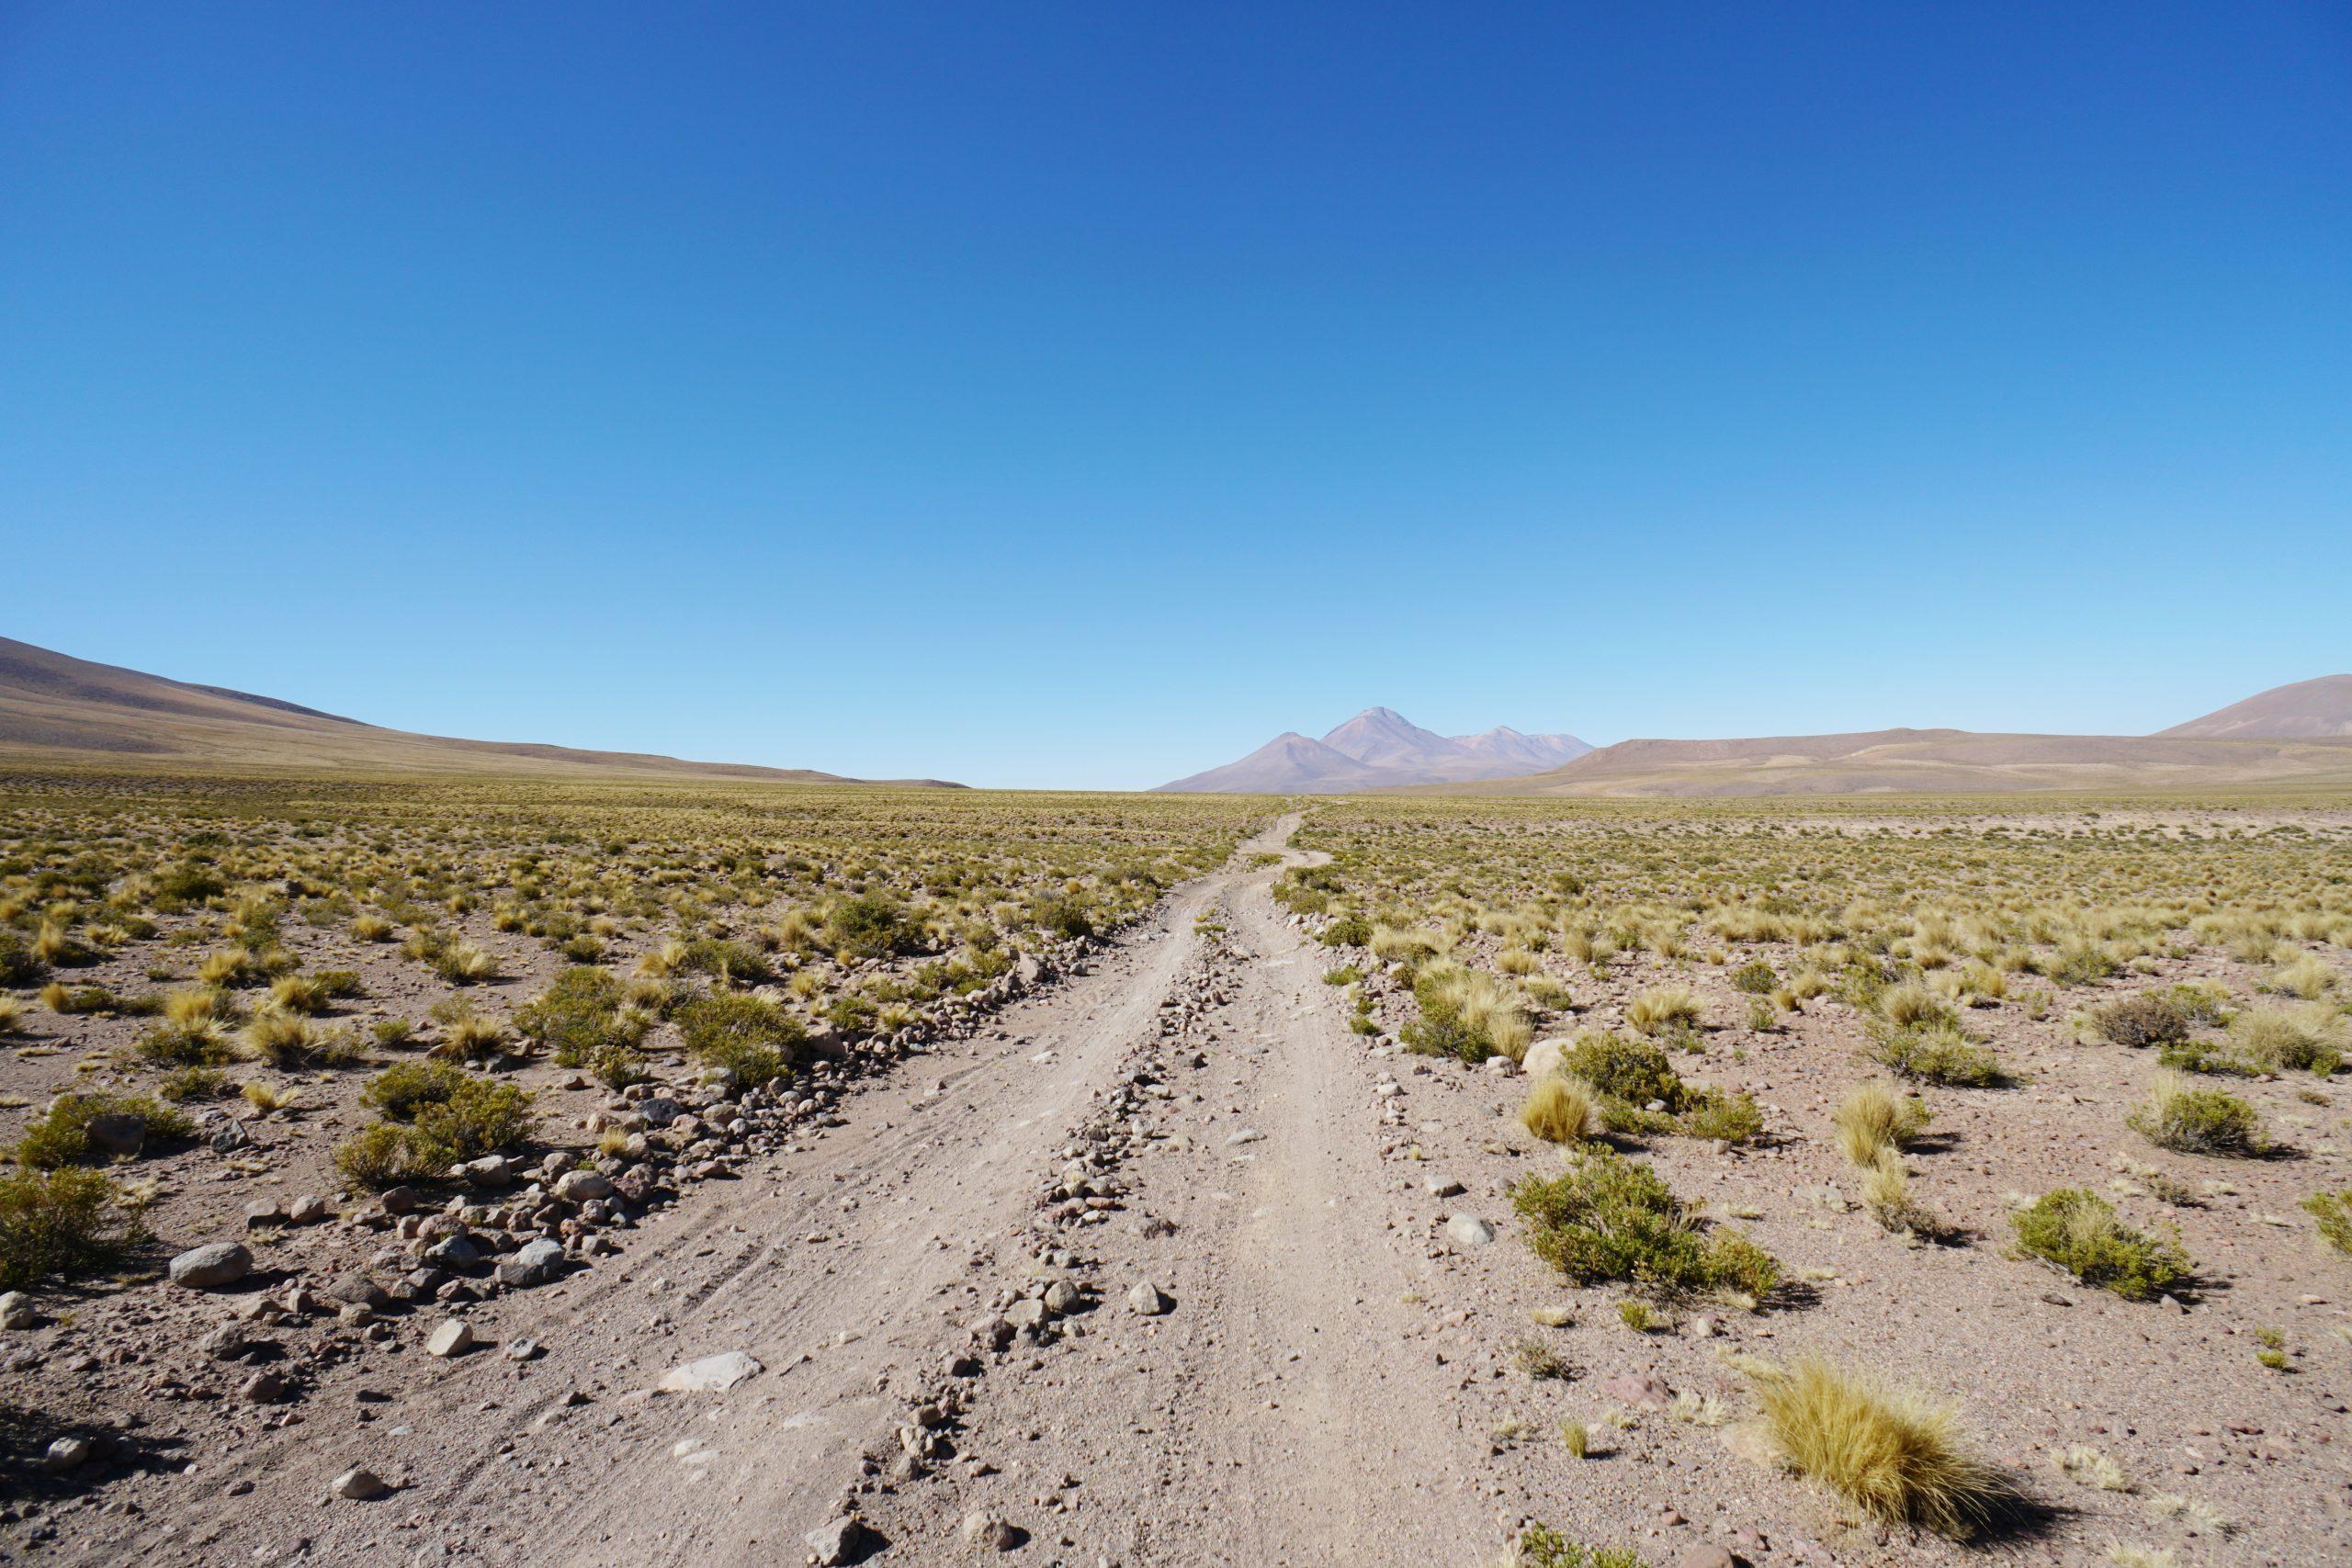 Radreise Südamerika 2019 - Lagunenroute